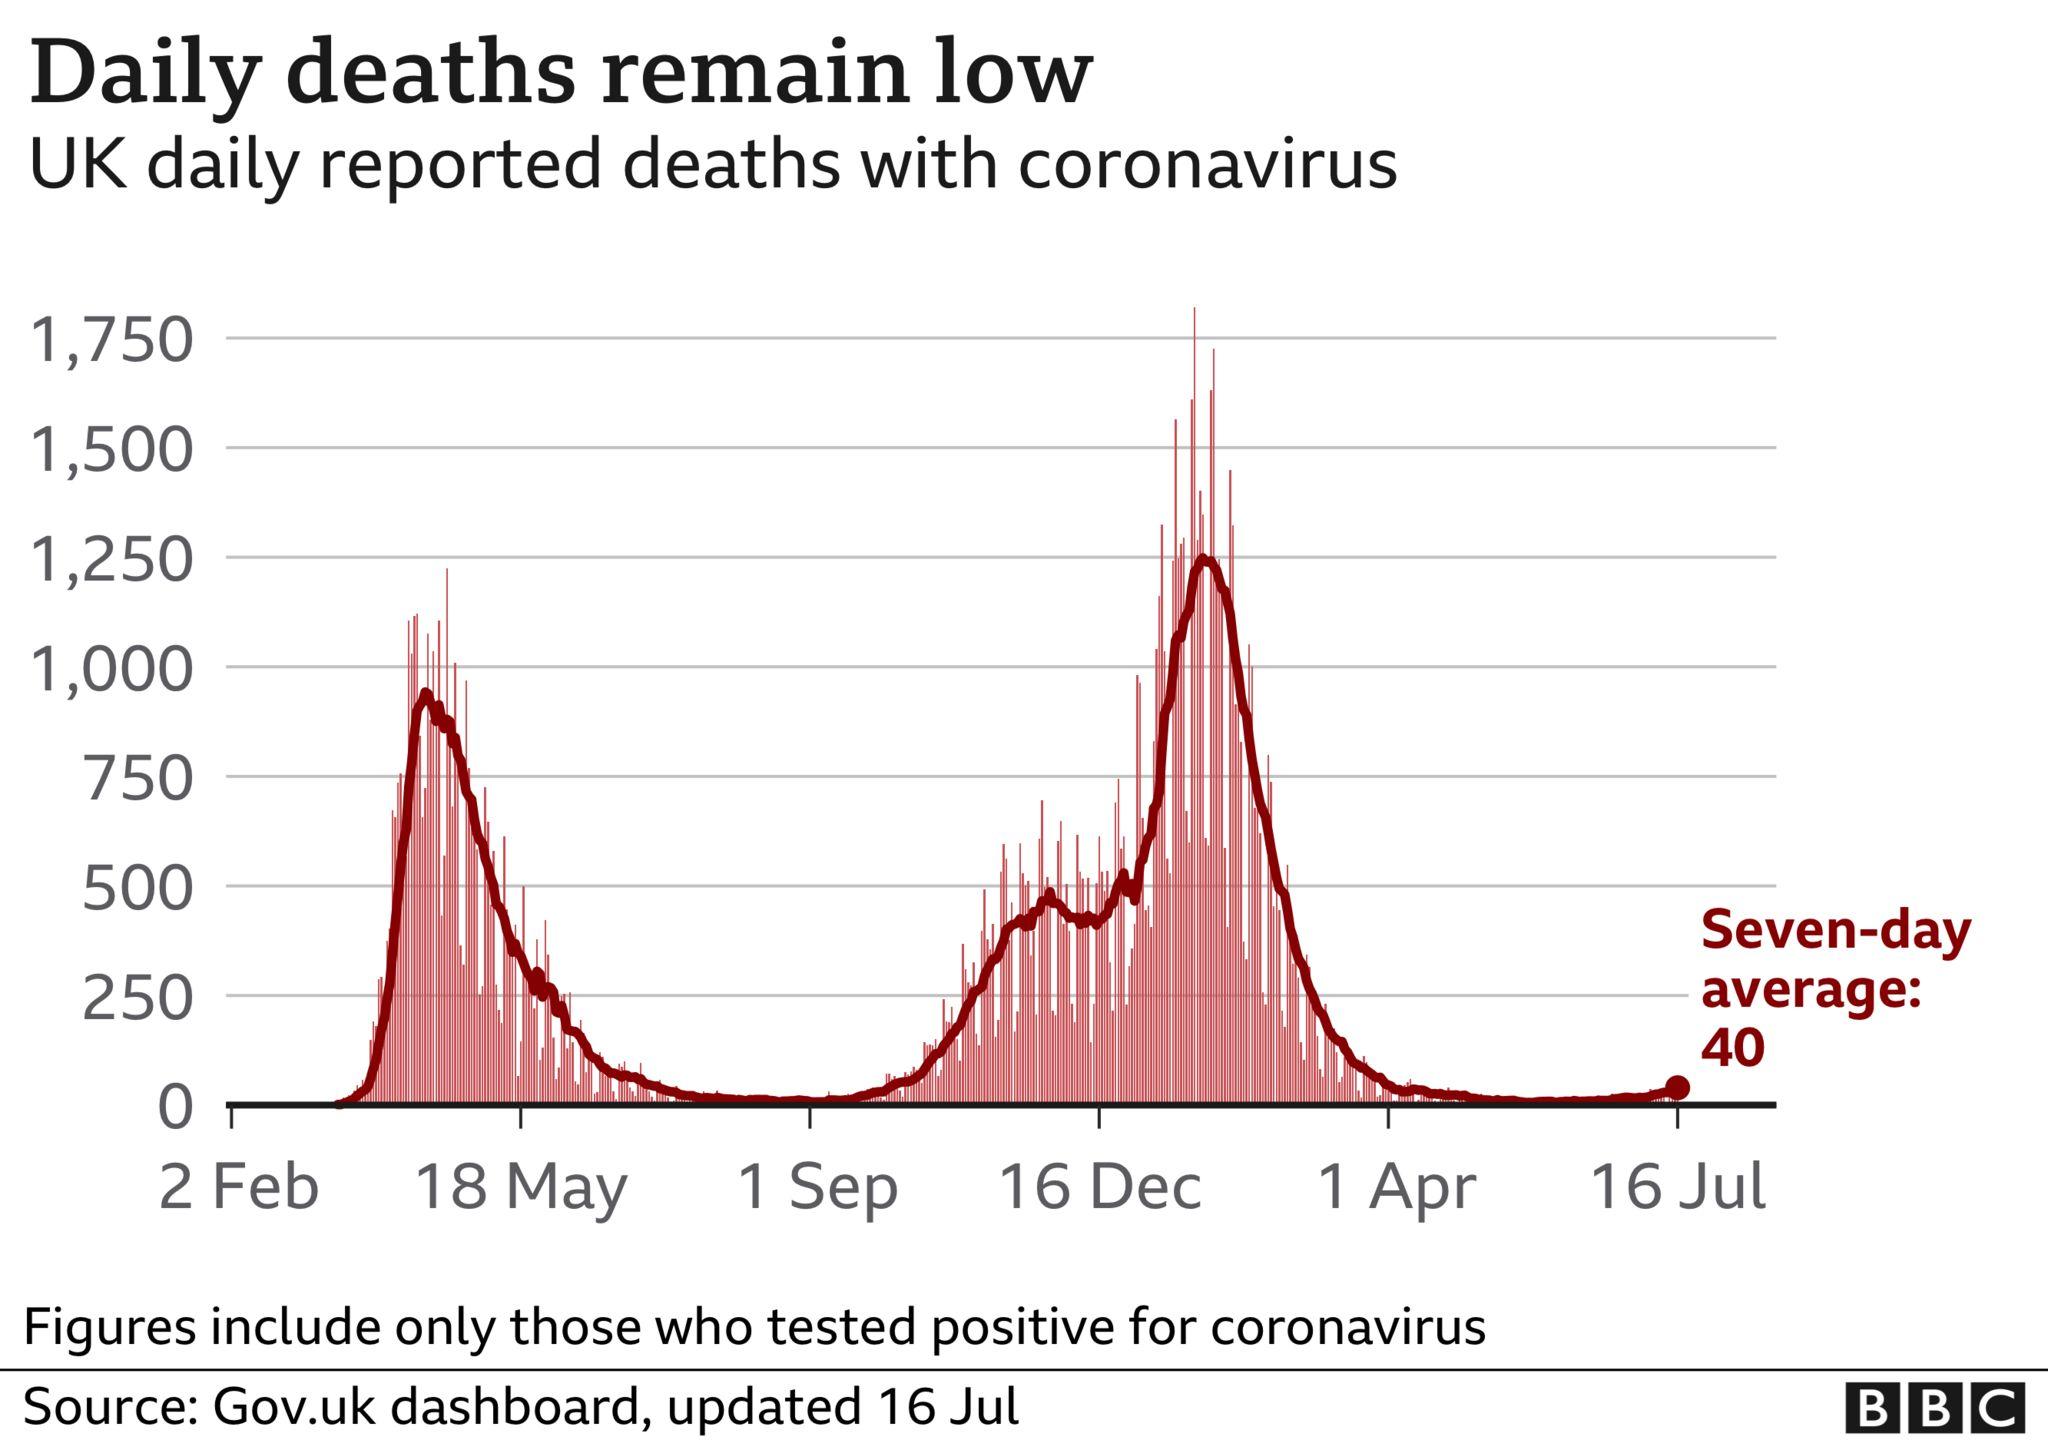 UK daily coronavirus deaths